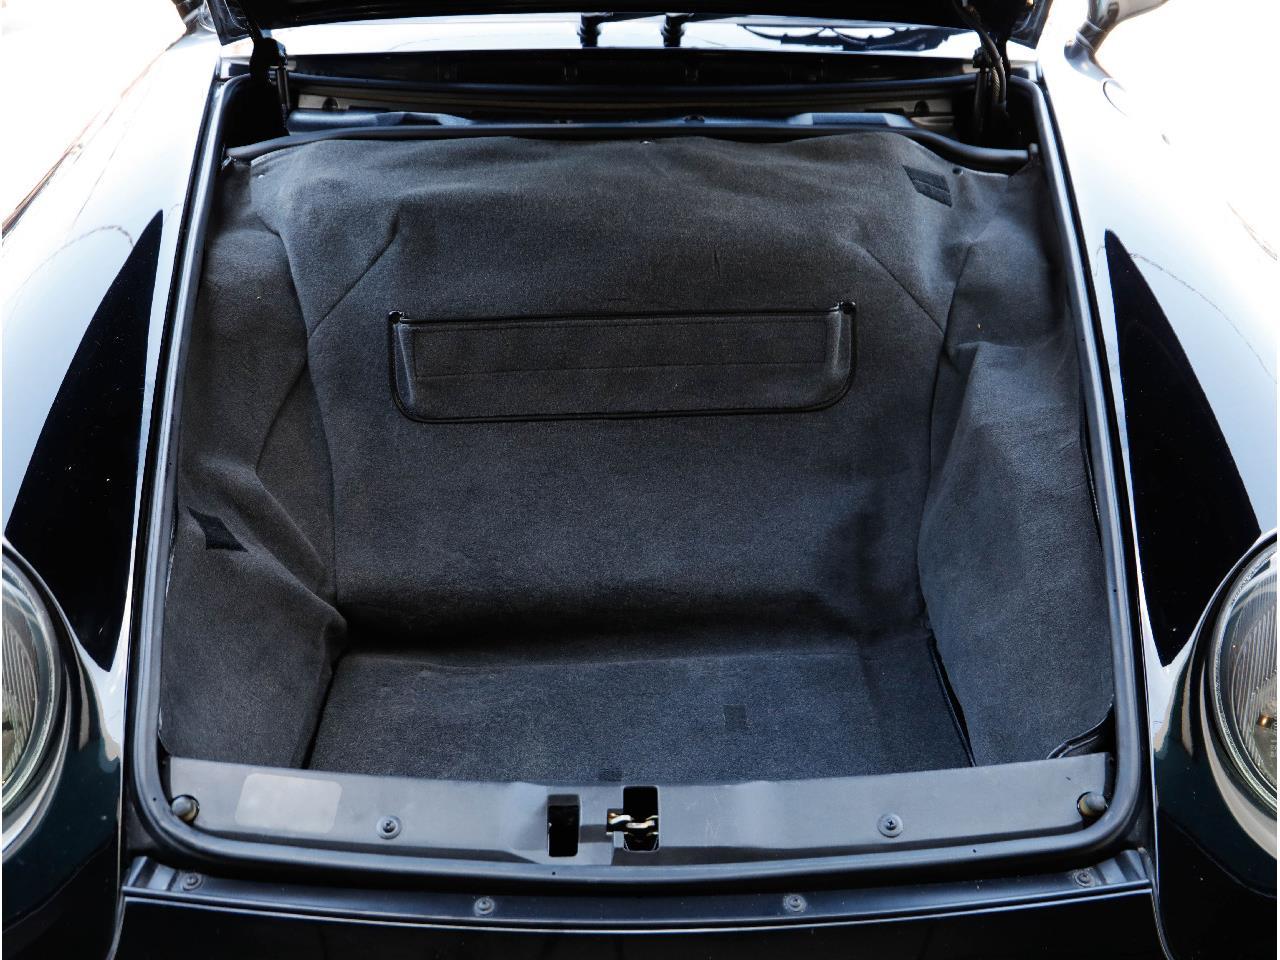 Large Picture of '97 Porsche 993 located in California - $67,500.00 - QKZ2